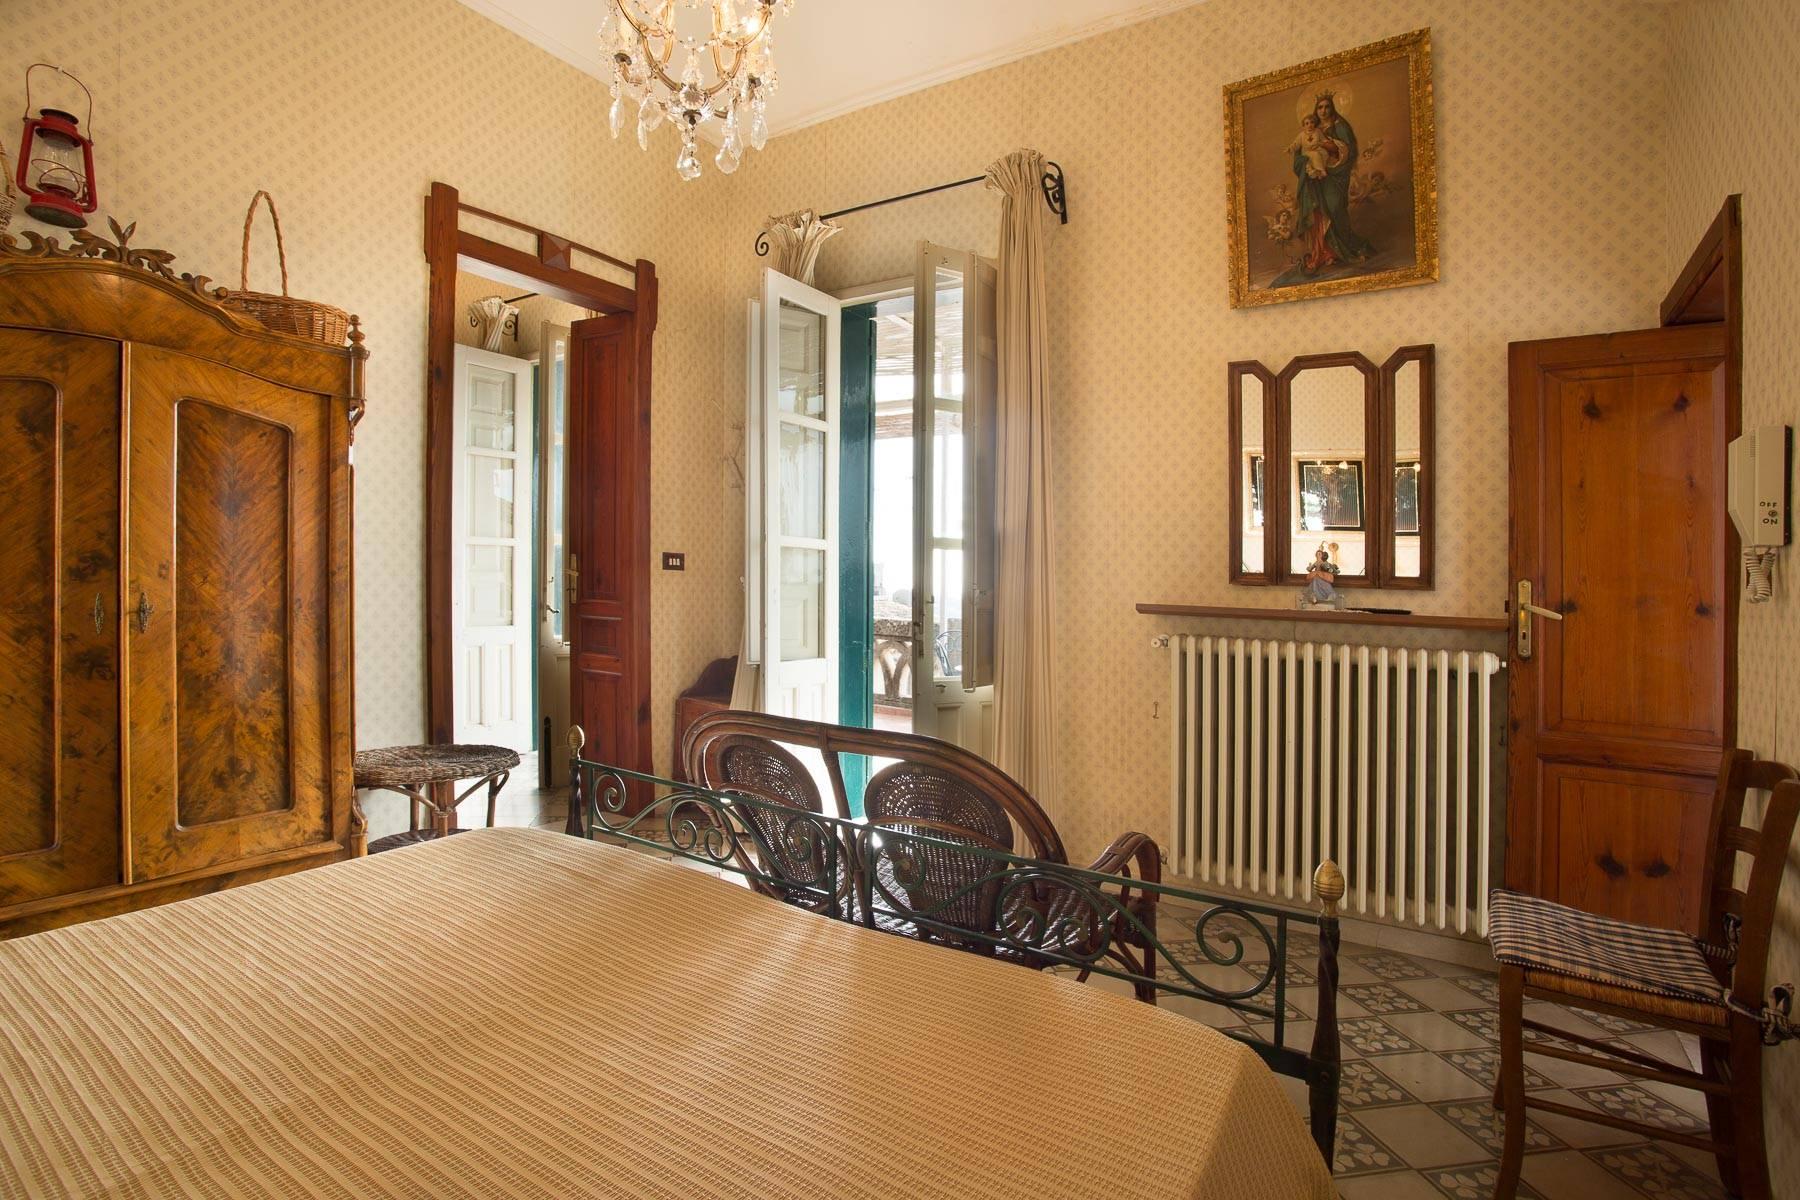 Casa indipendente in Vendita a Noto: 5 locali, 280 mq - Foto 20